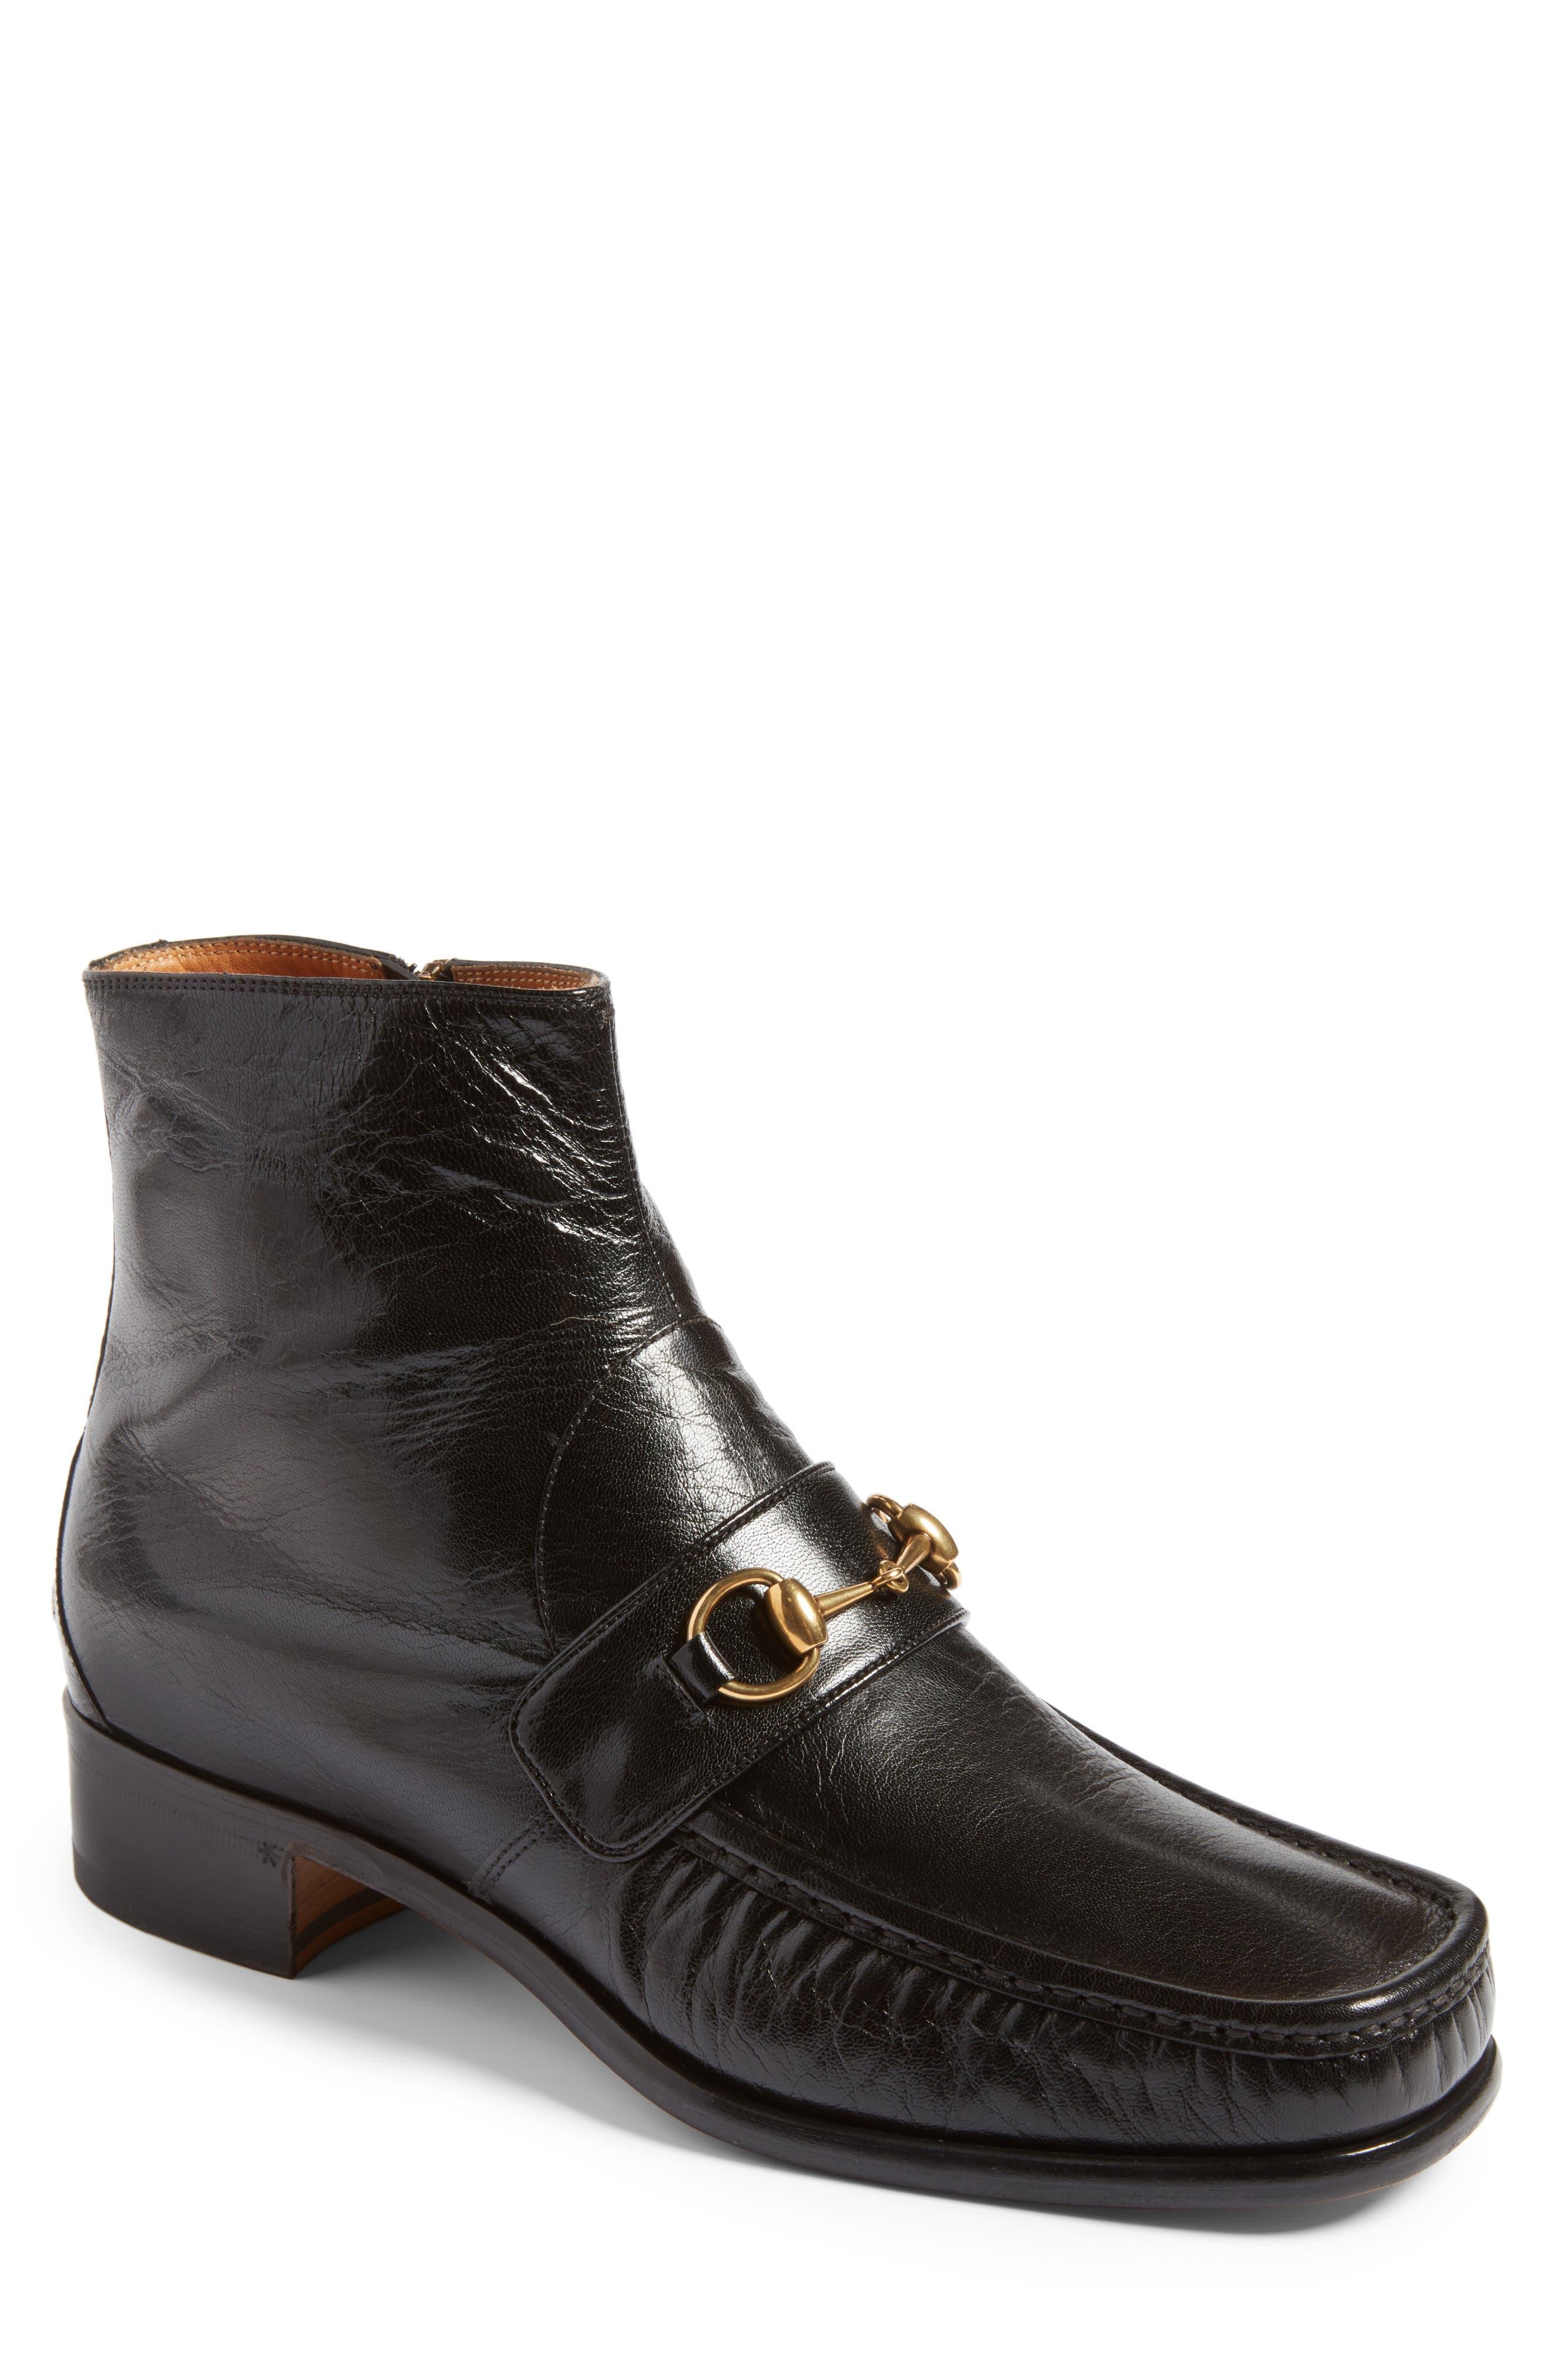 Vegas Apron Boot,                         Main,                         color, Black